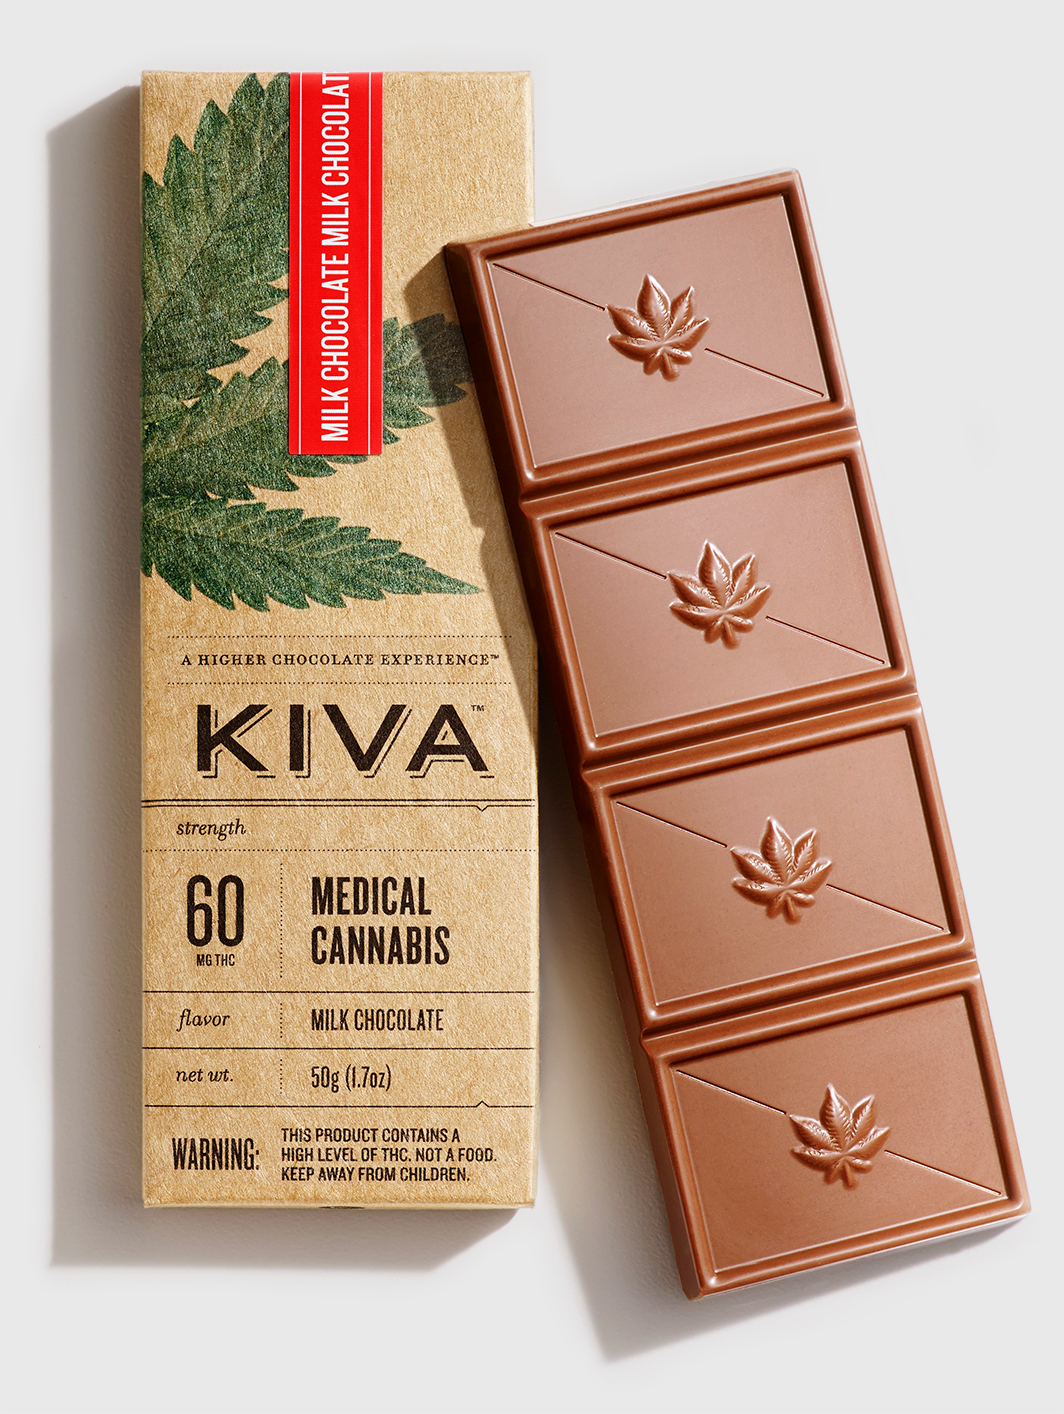 Kiva bar packaging #Craft #Technical #Cannabis | Chocolate ...